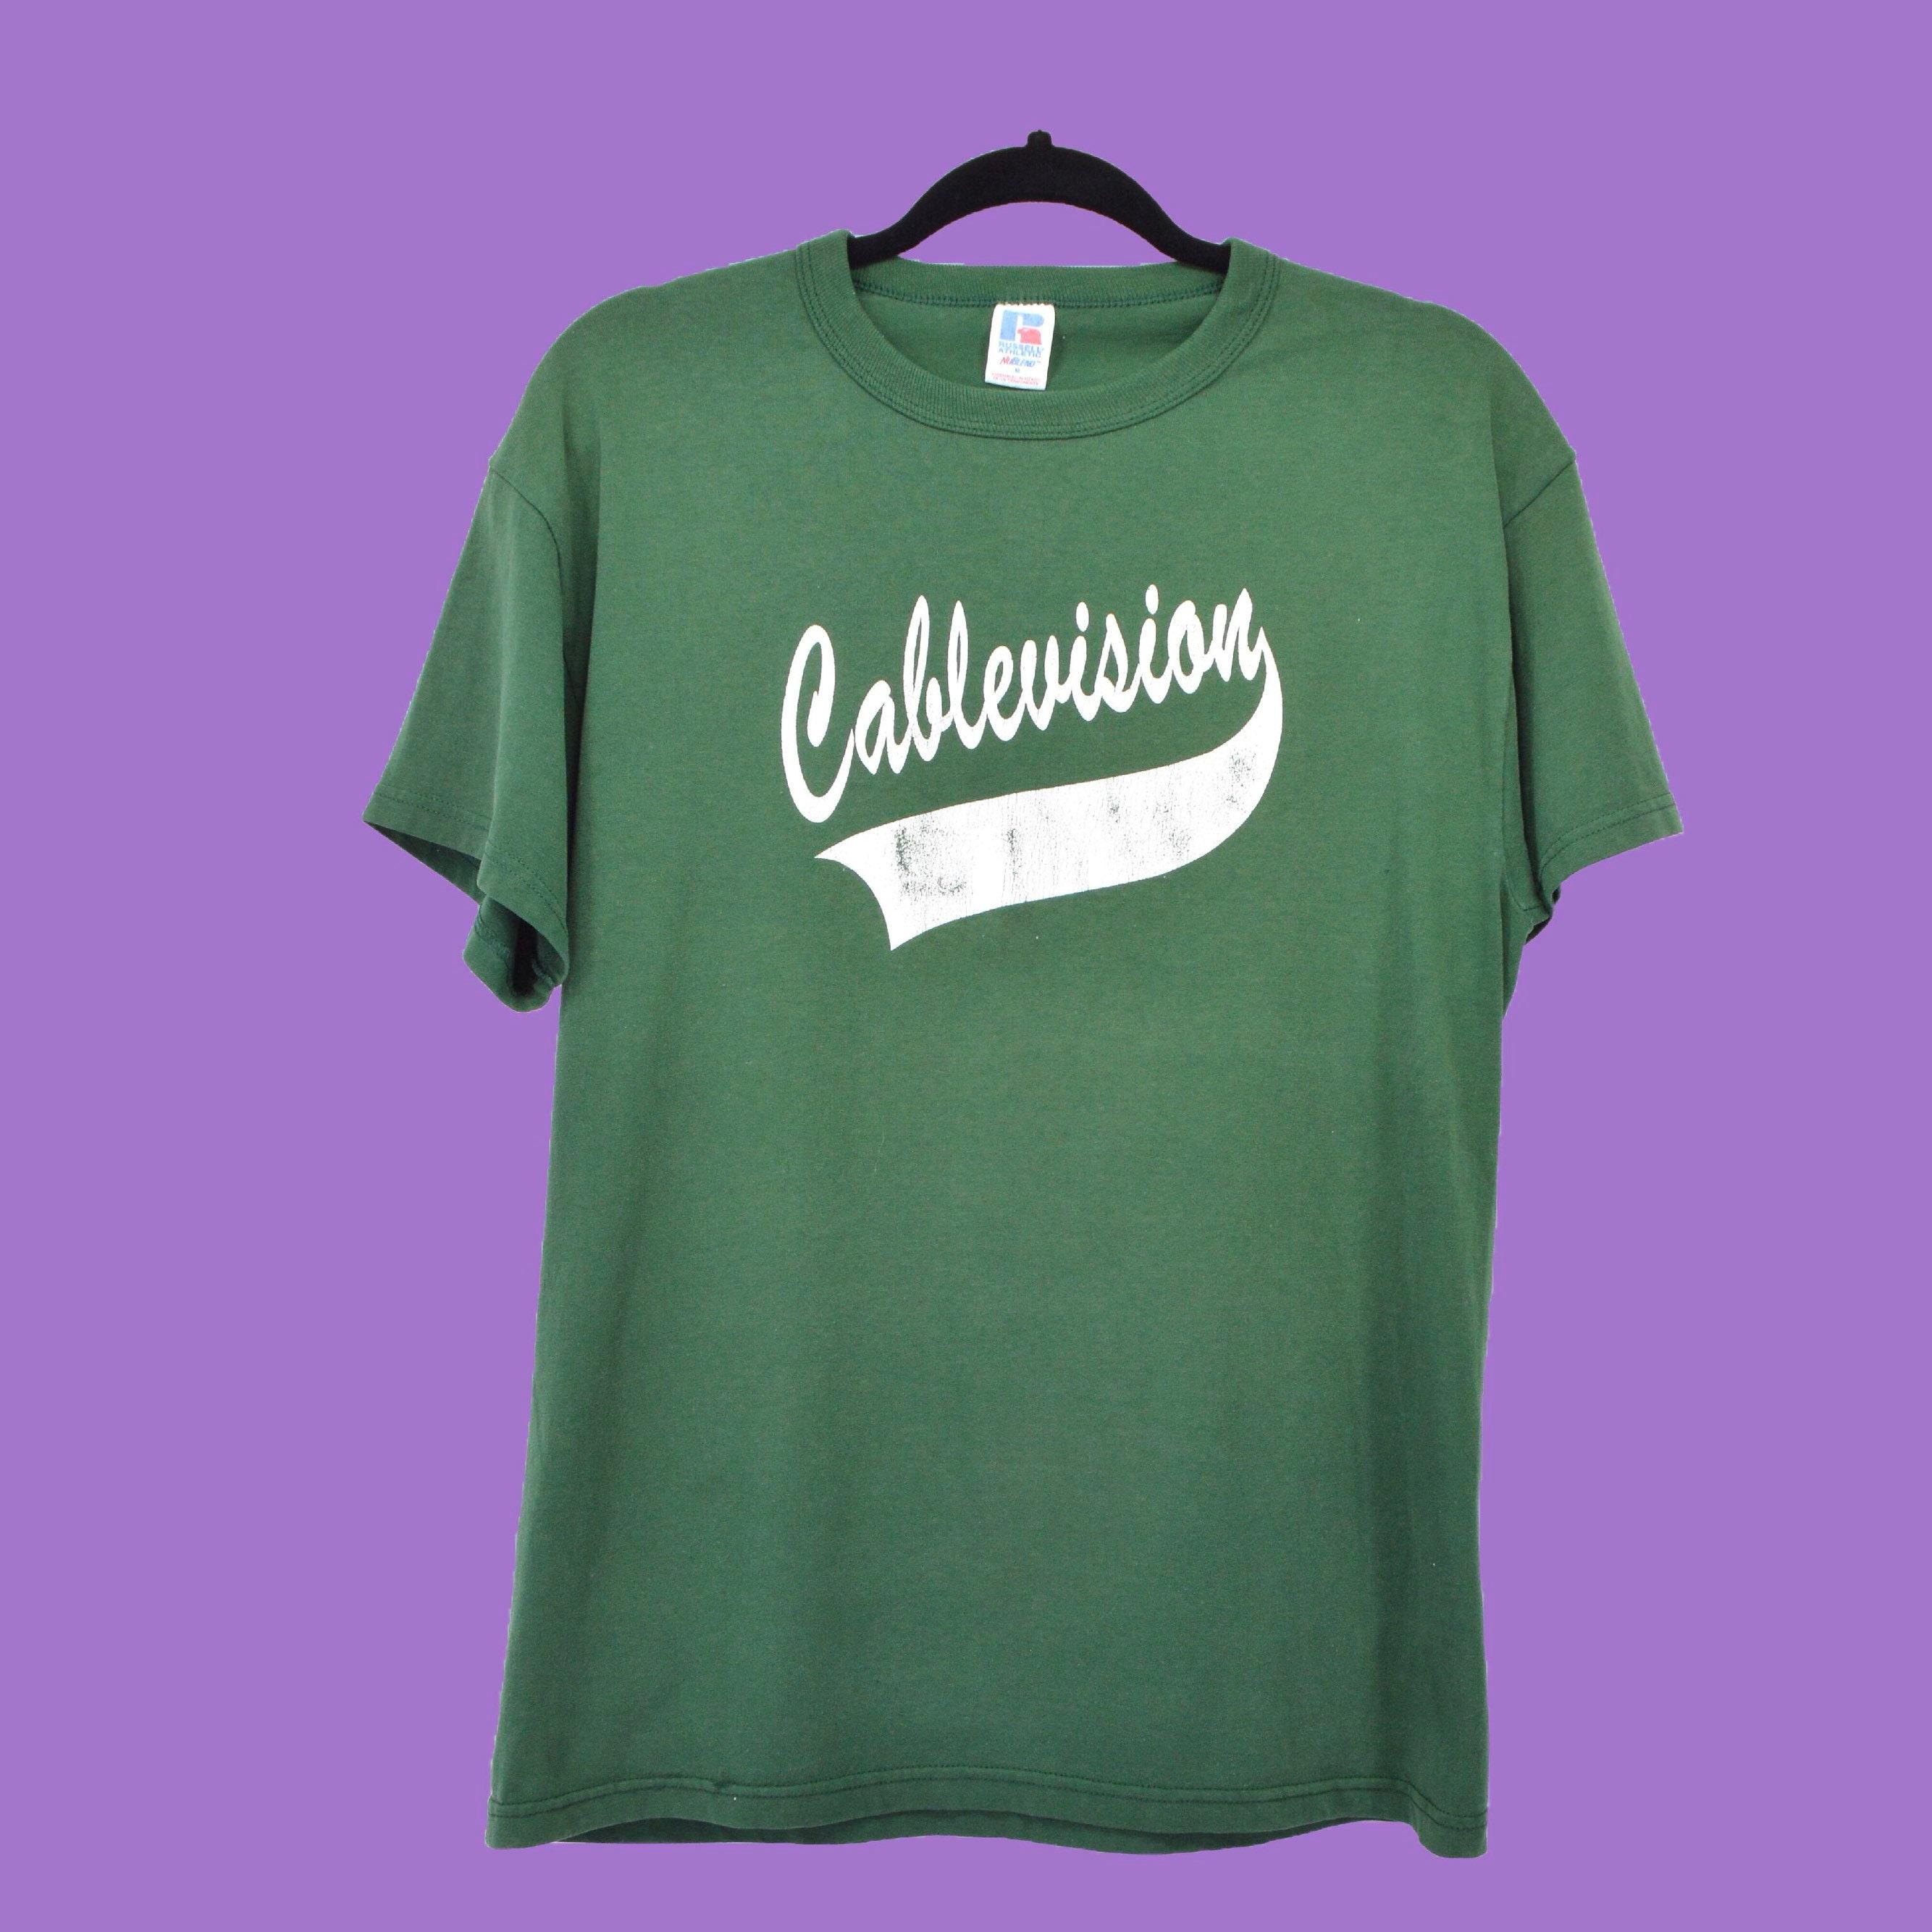 29b67dcce Vintage American Sports T Shirts - DREAMWORKS